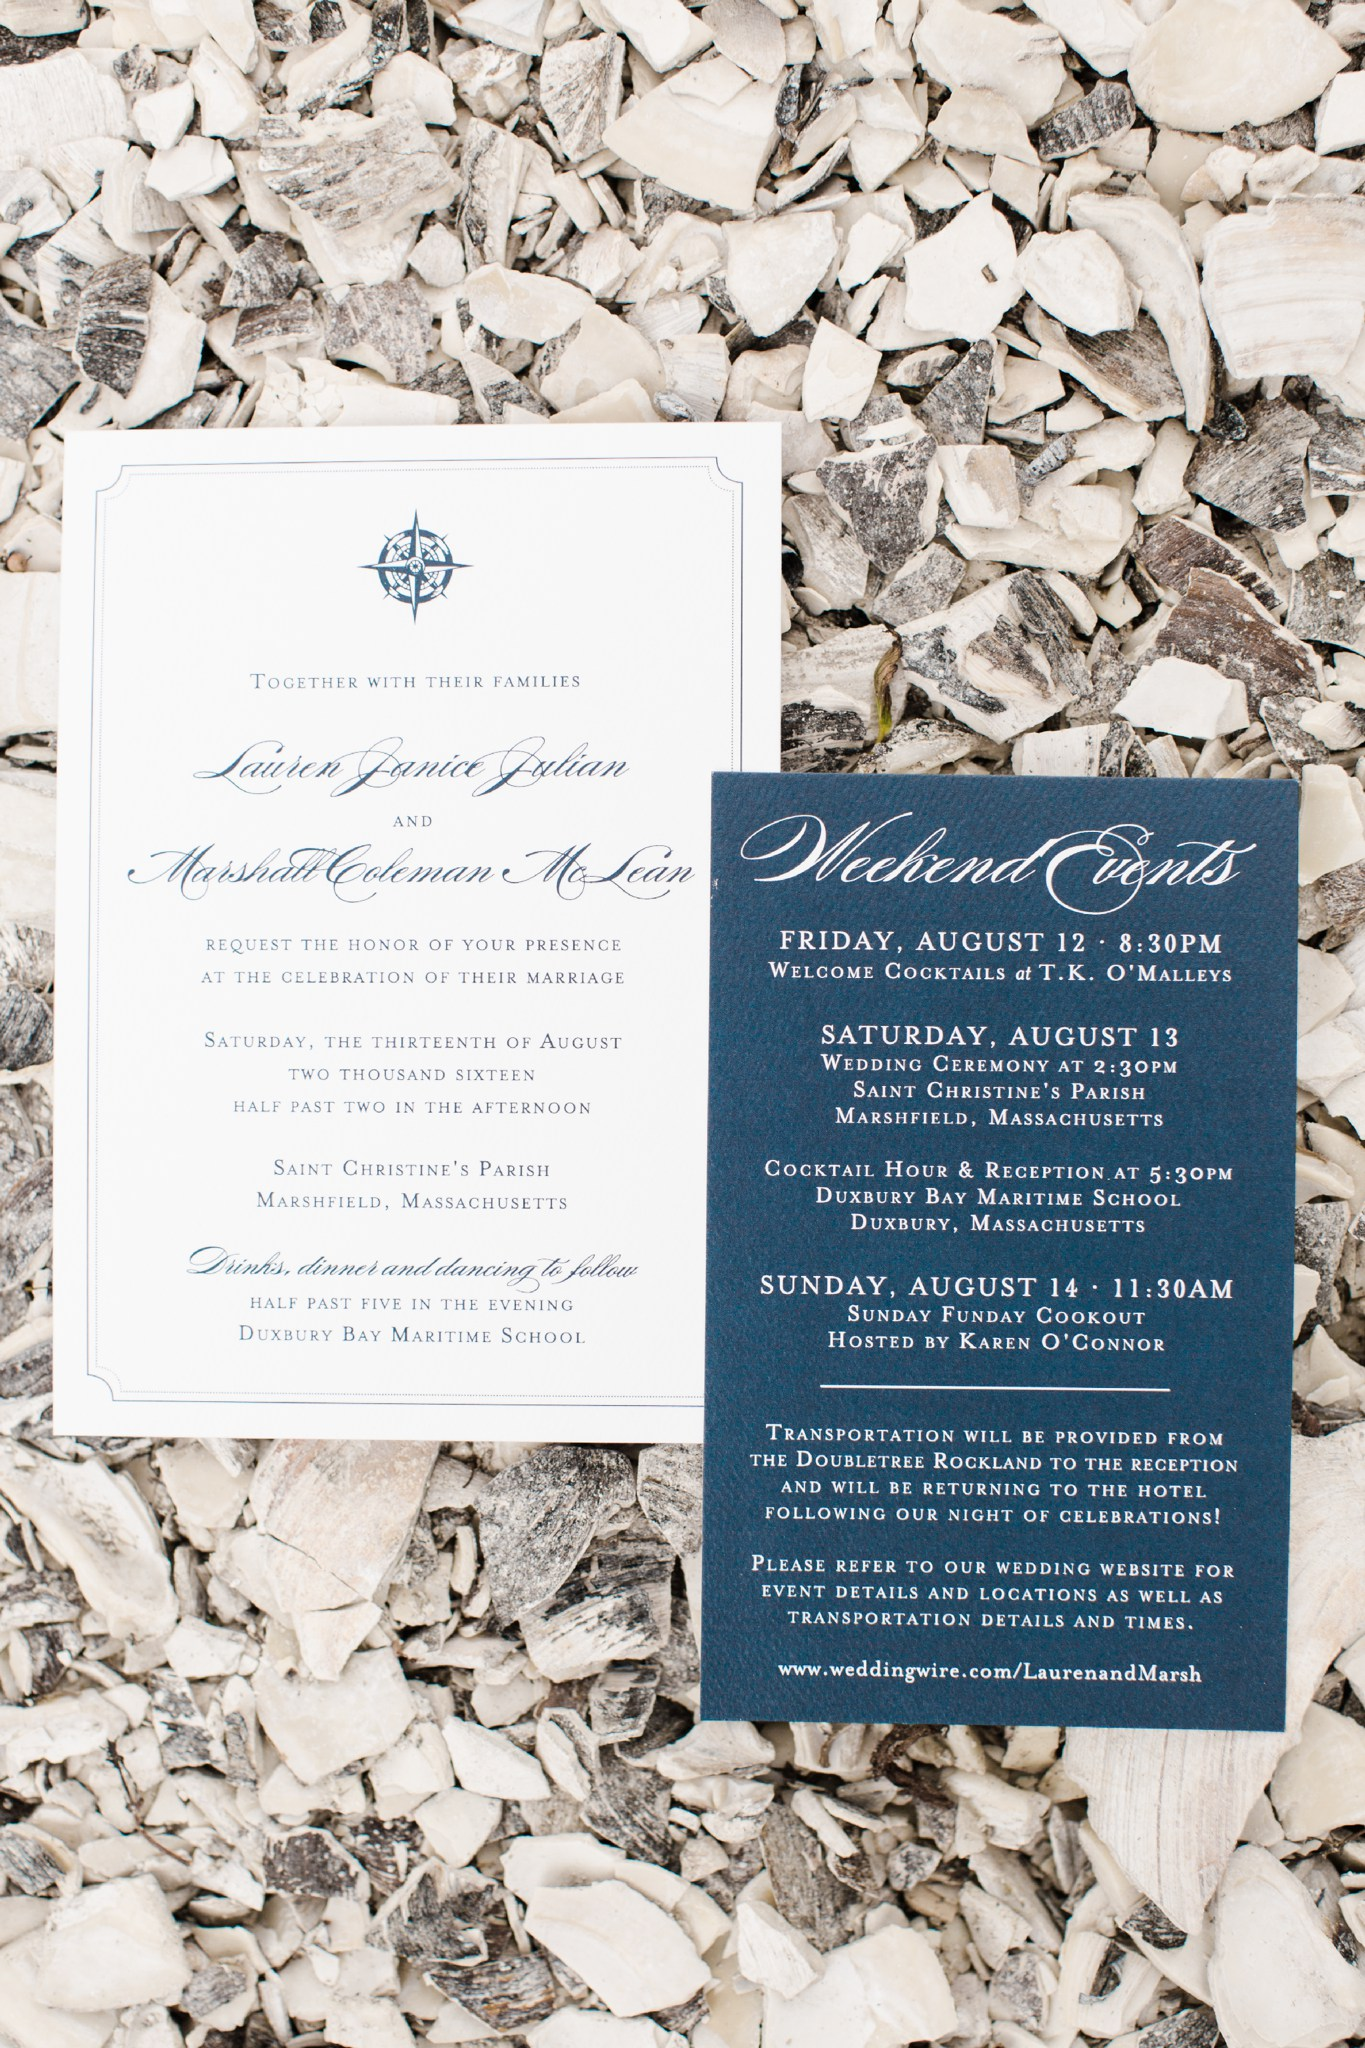 duxbury_bay_maritime_school_wedding_deborah_zoe_0002.JPG